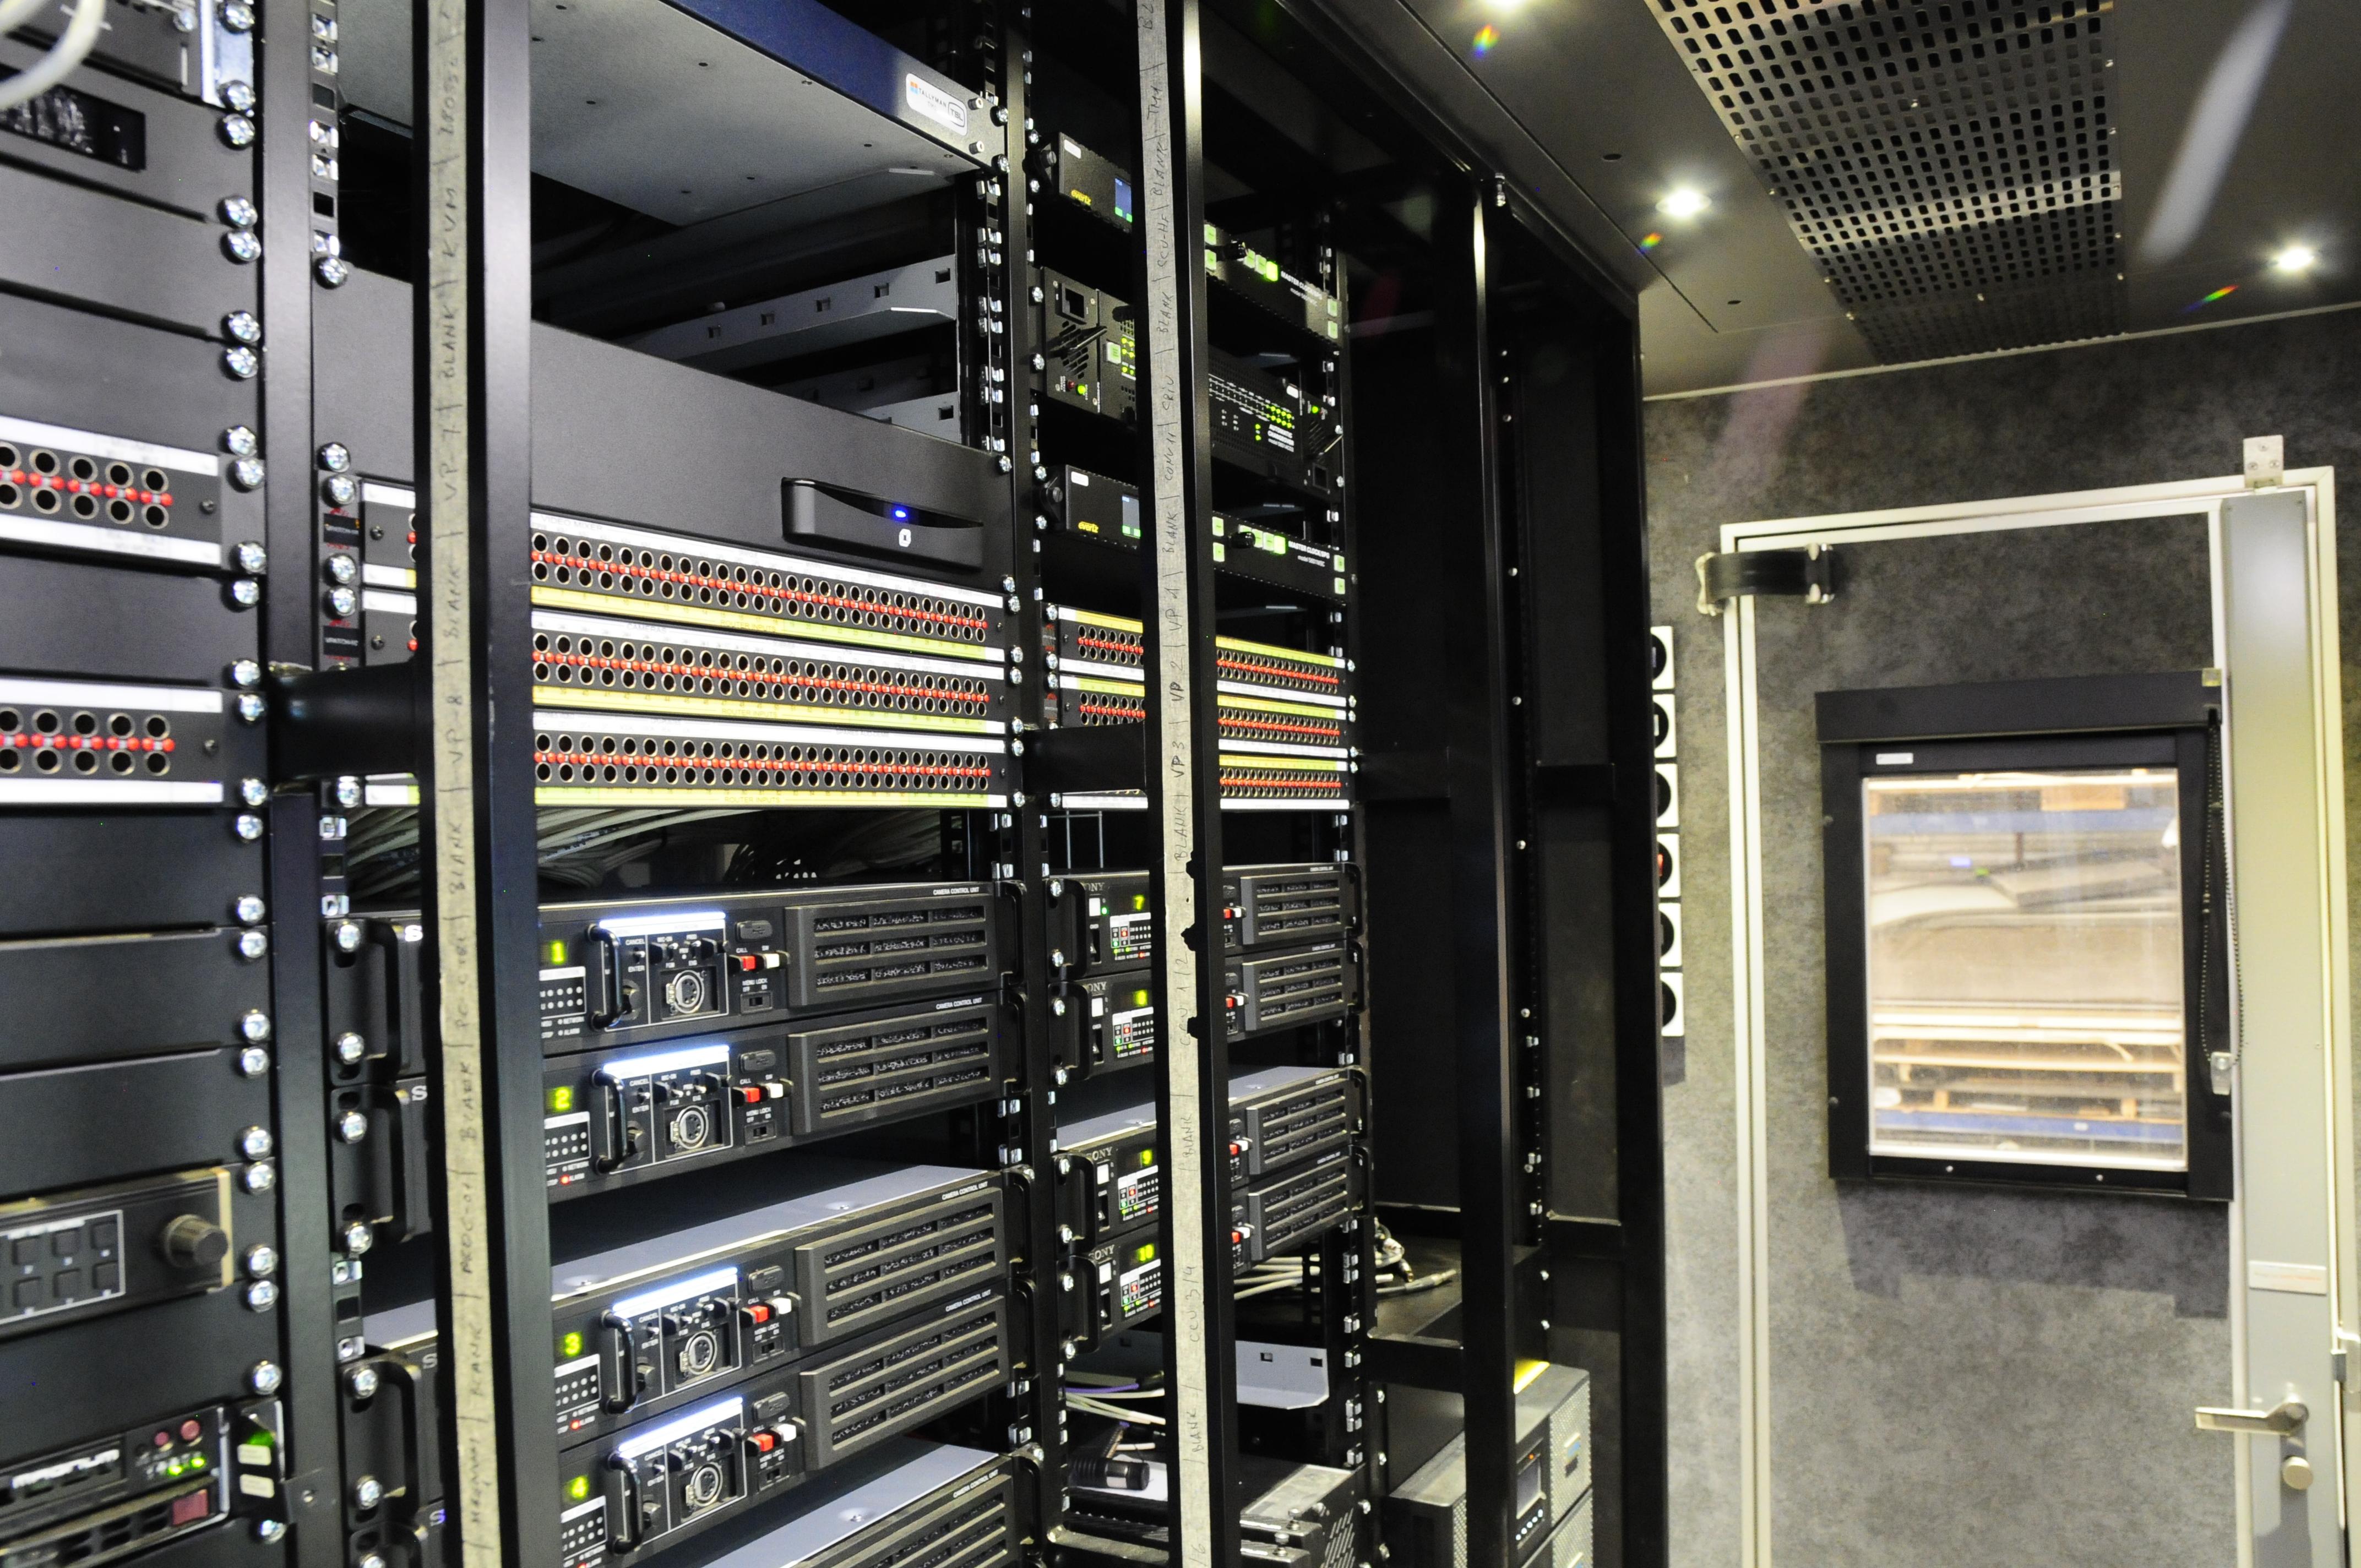 Technical racks